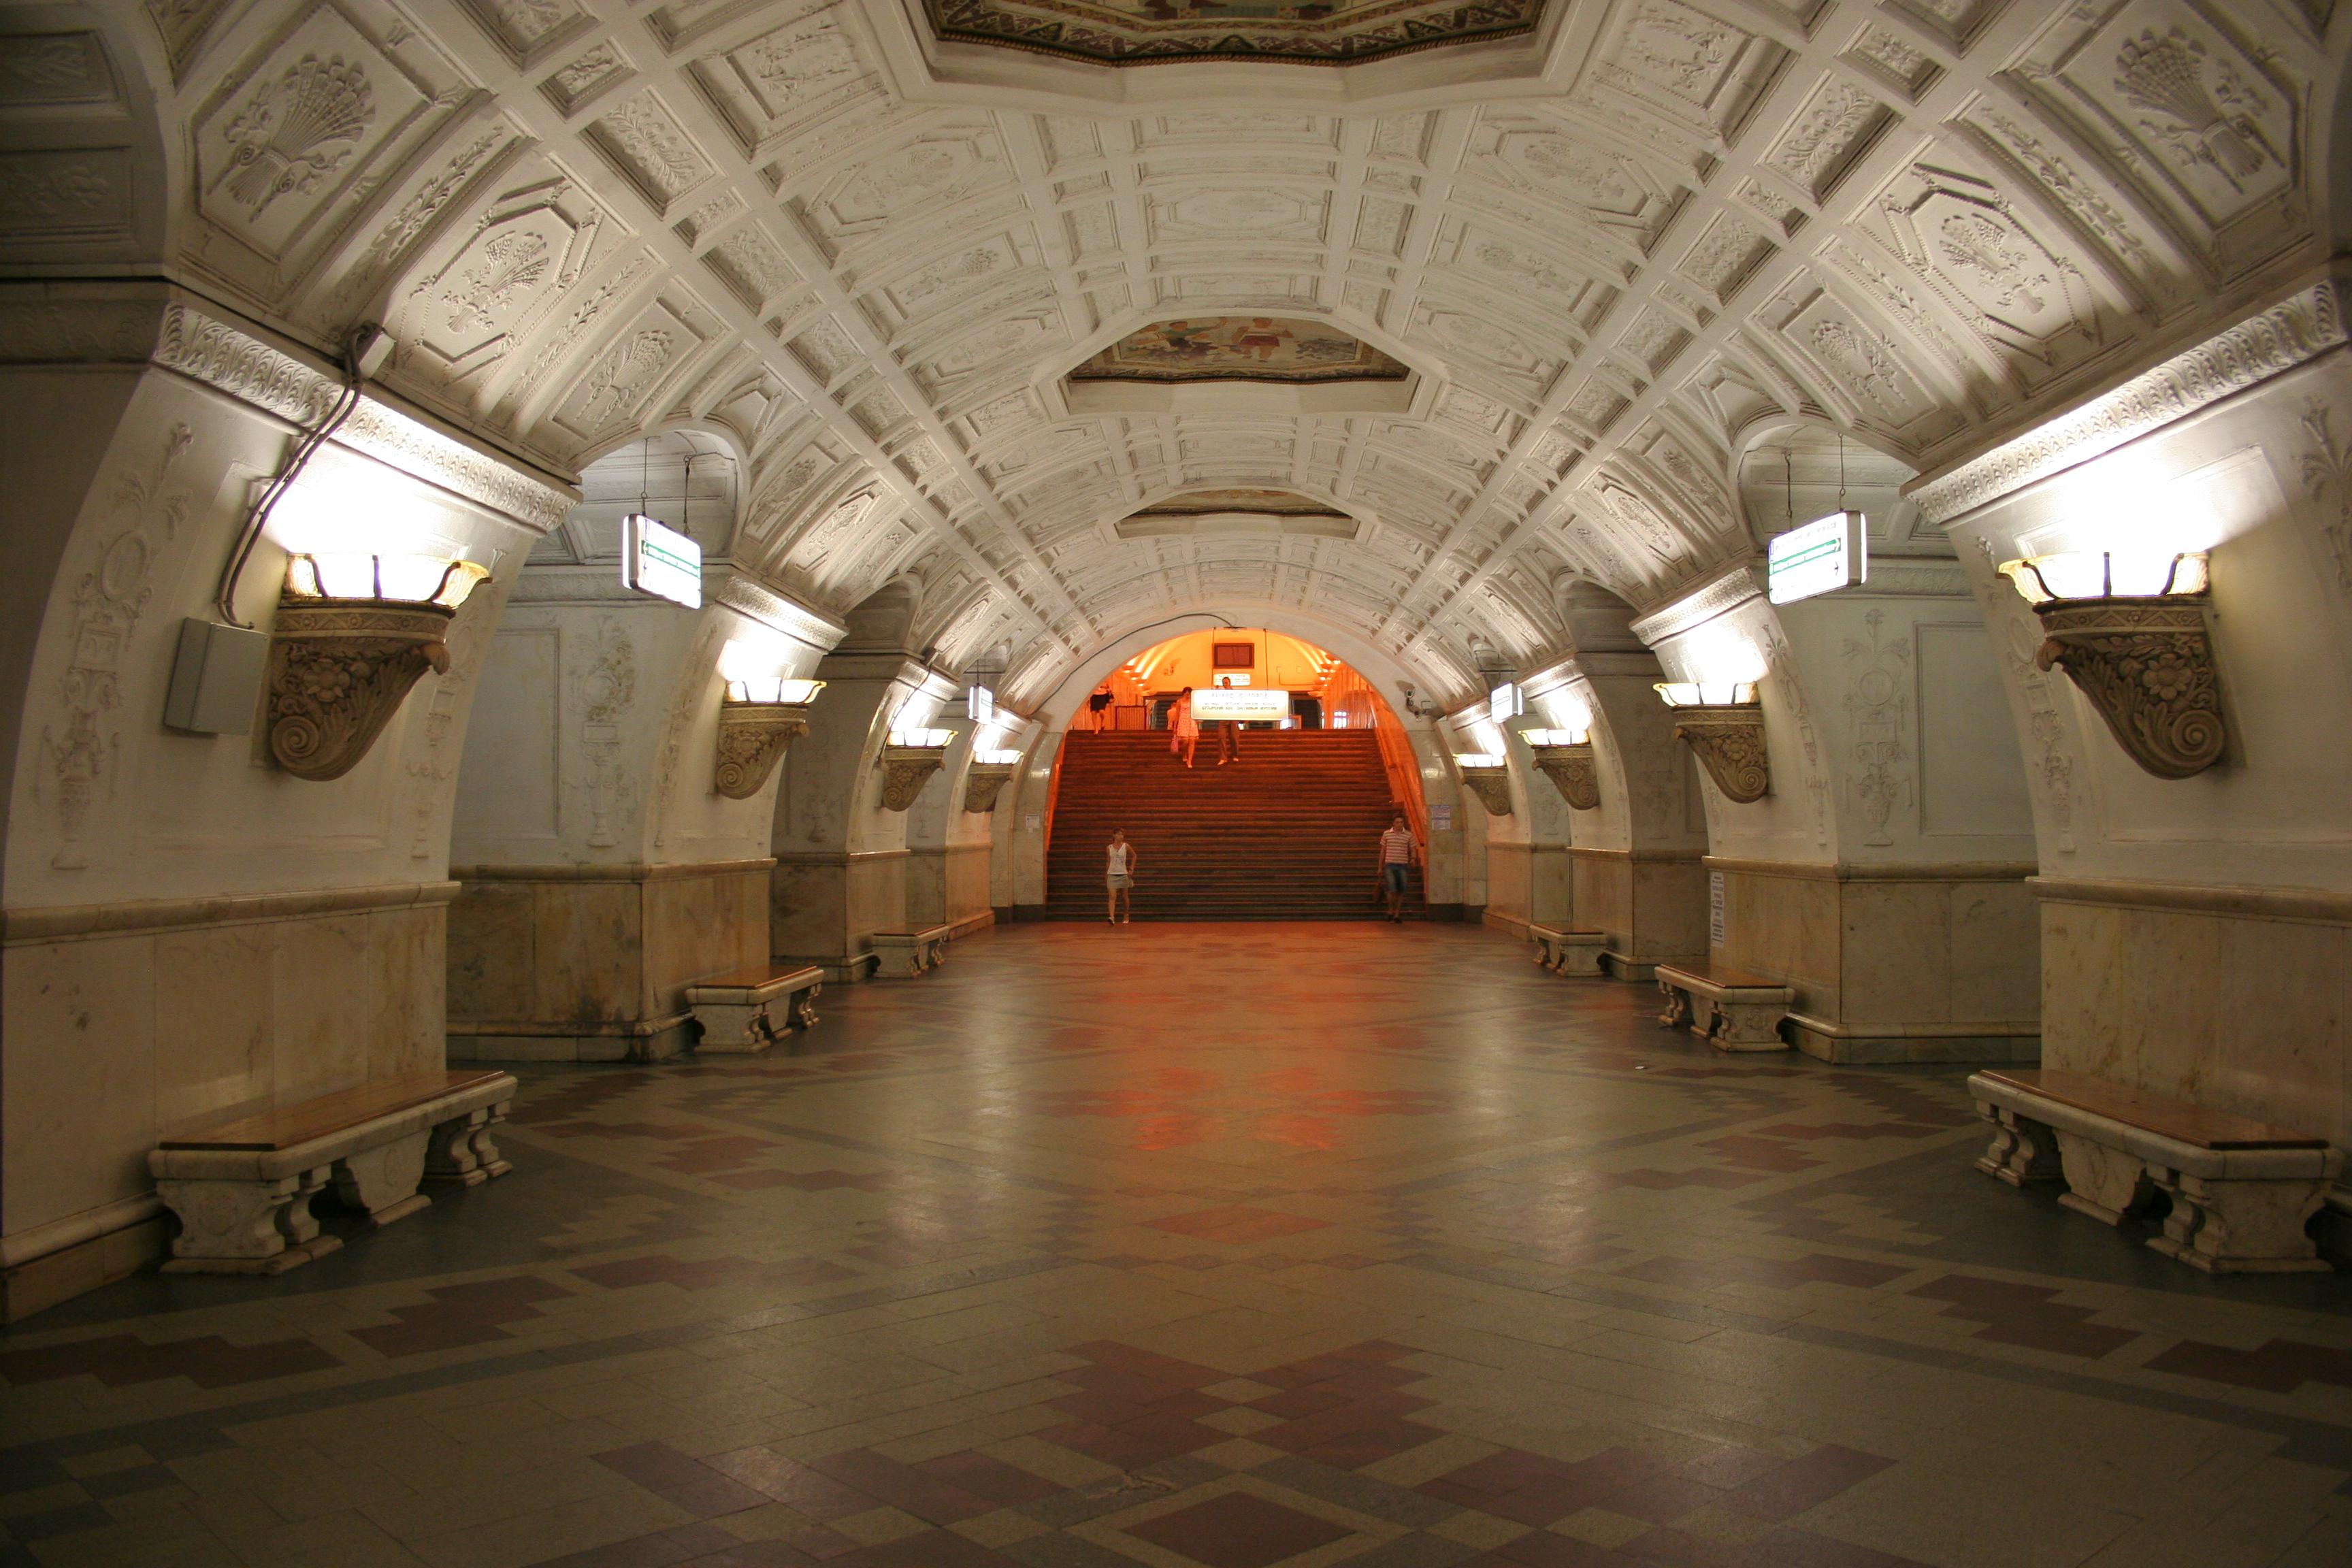 file moscow metro belorusskaya wikimedia commons. Black Bedroom Furniture Sets. Home Design Ideas